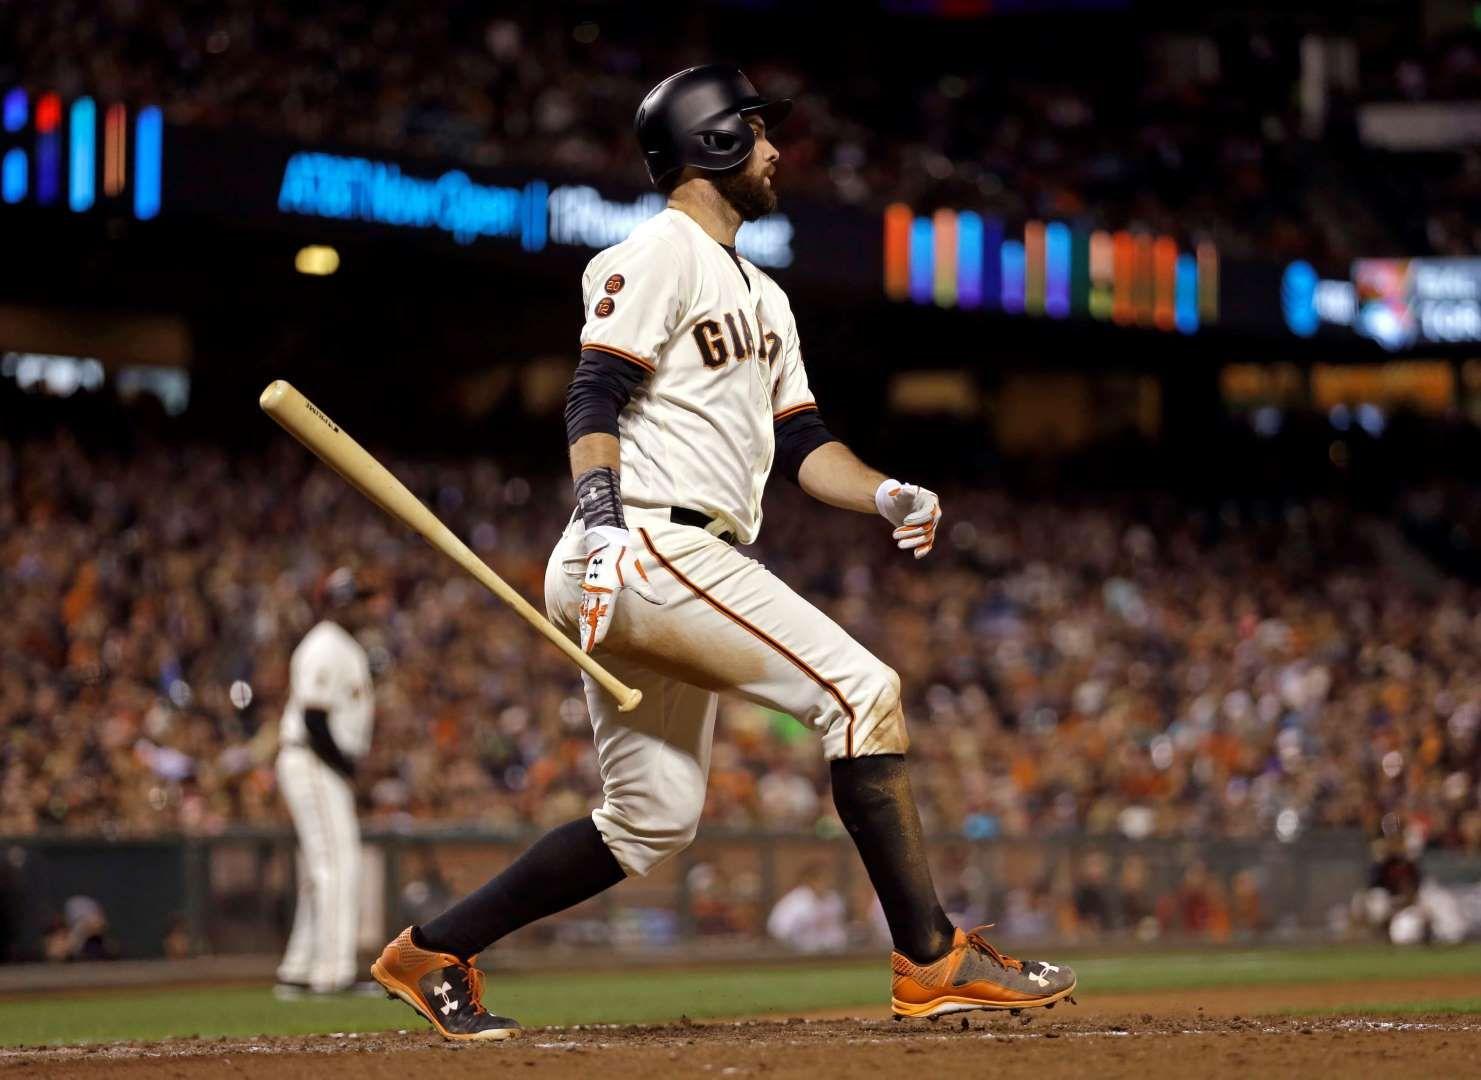 Wood Toss The Giants Brandon Belt Drops His Bat After Hitting An Rbi Single Against The Rockies On Sept 27 In San Francis Major League Baseball Mlb Baseball